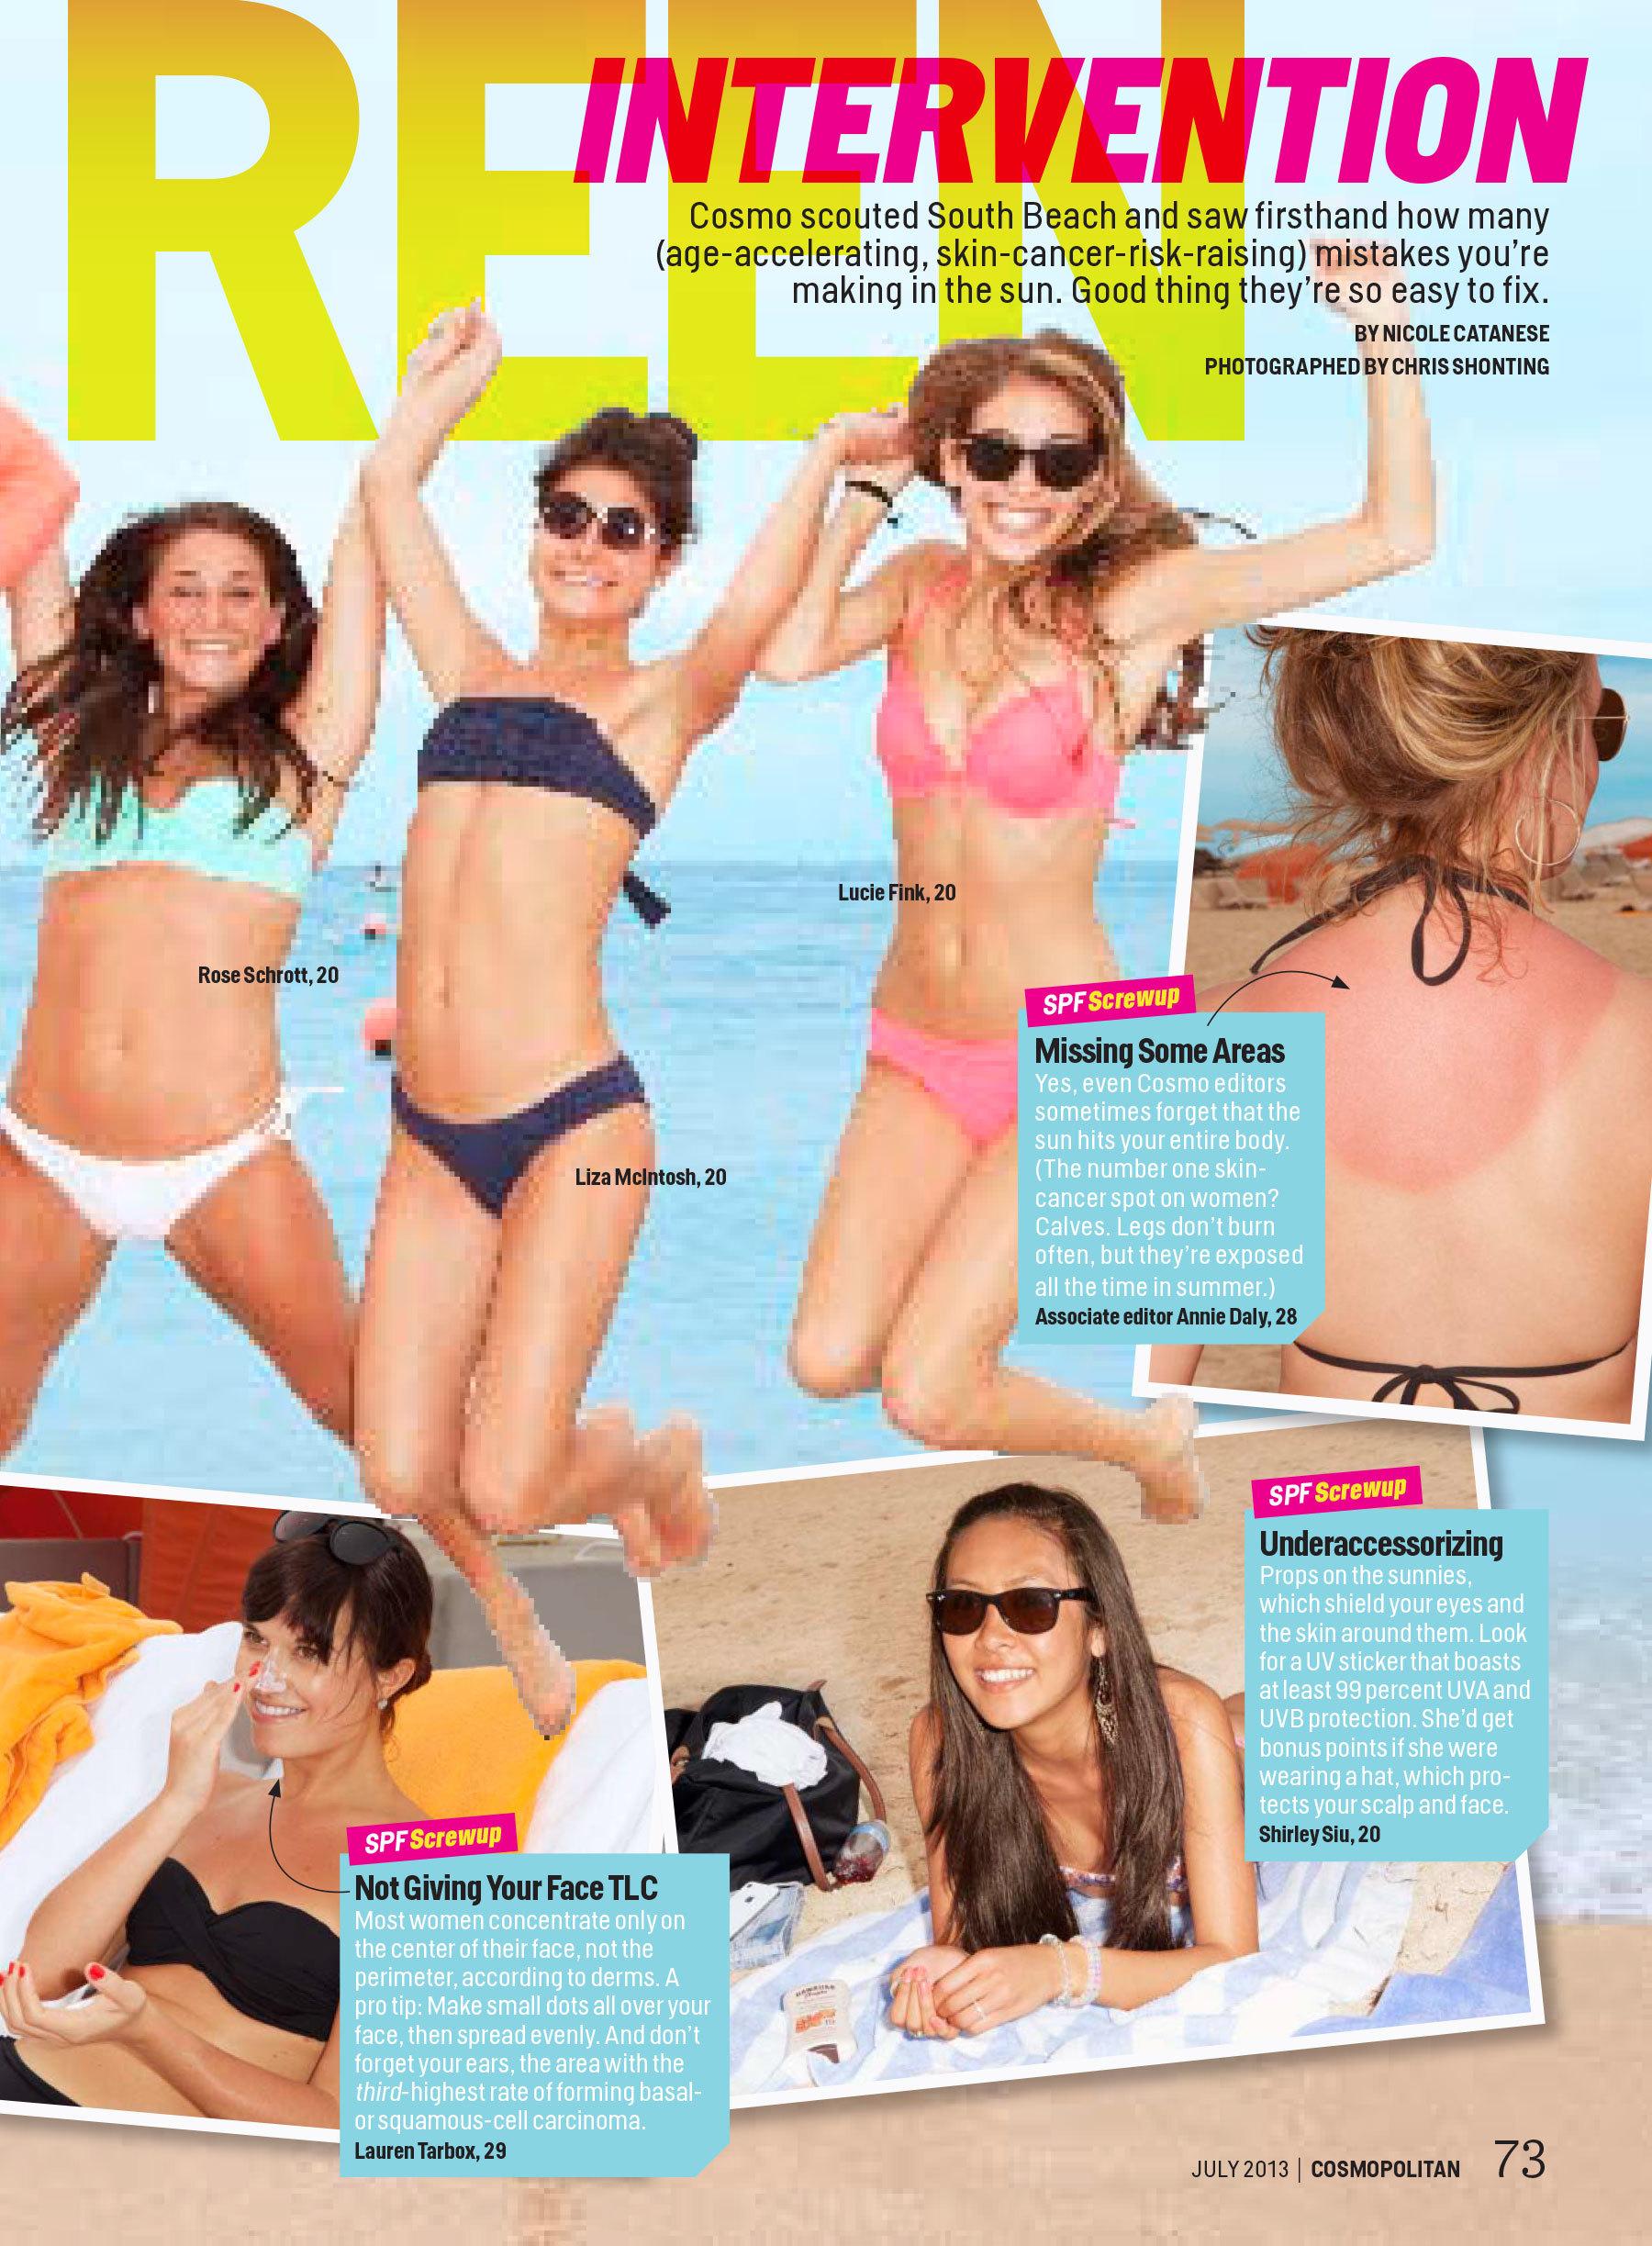 NicoleCatanese_Cosmopolitan_SunscreenIntervention_B.jpg